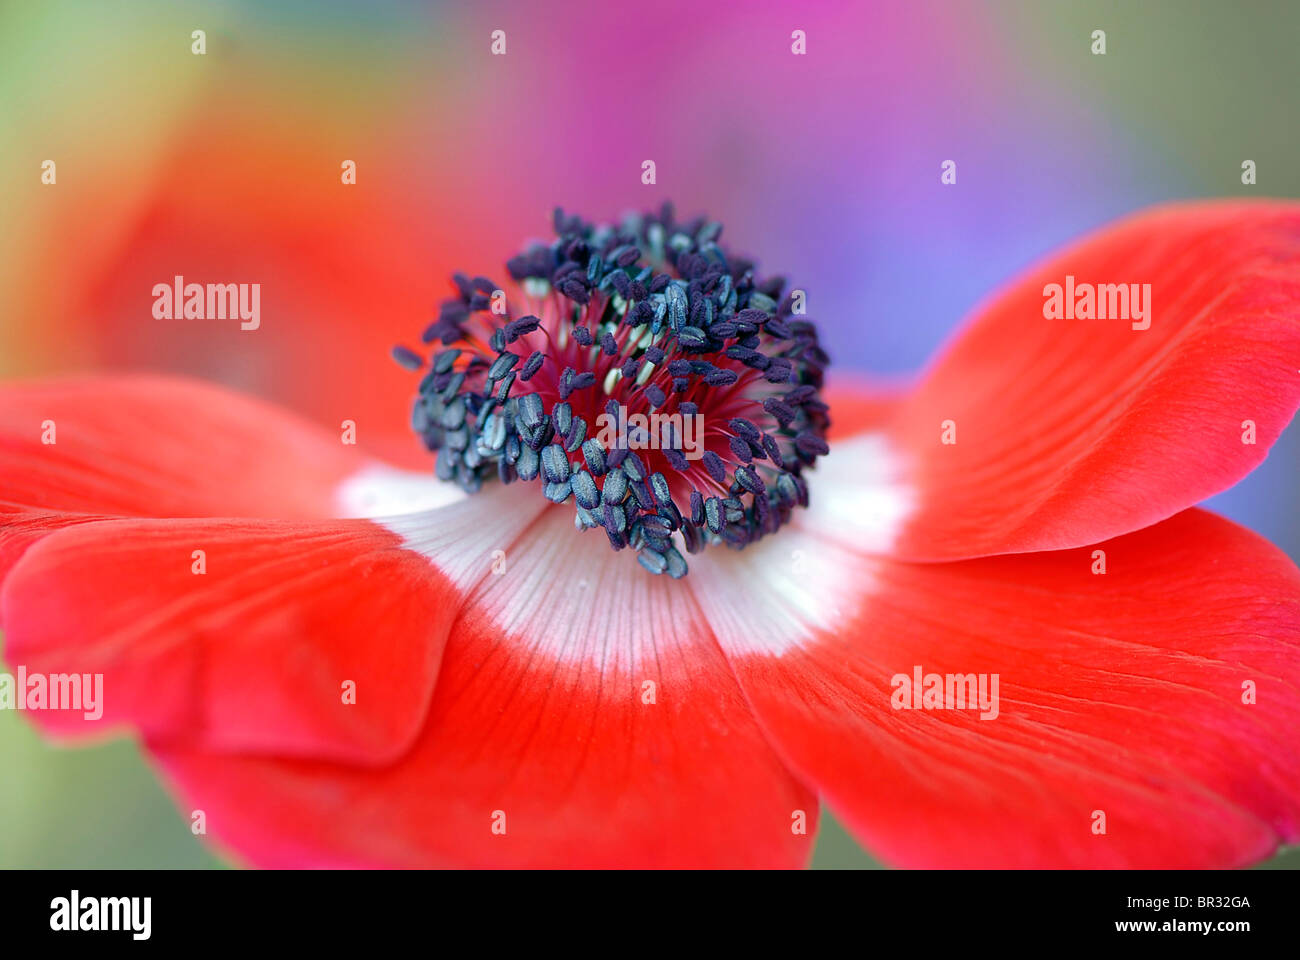 A single red & white Anemone flower head, Anemone coronaria de Caen strain - windflower - Stock Image